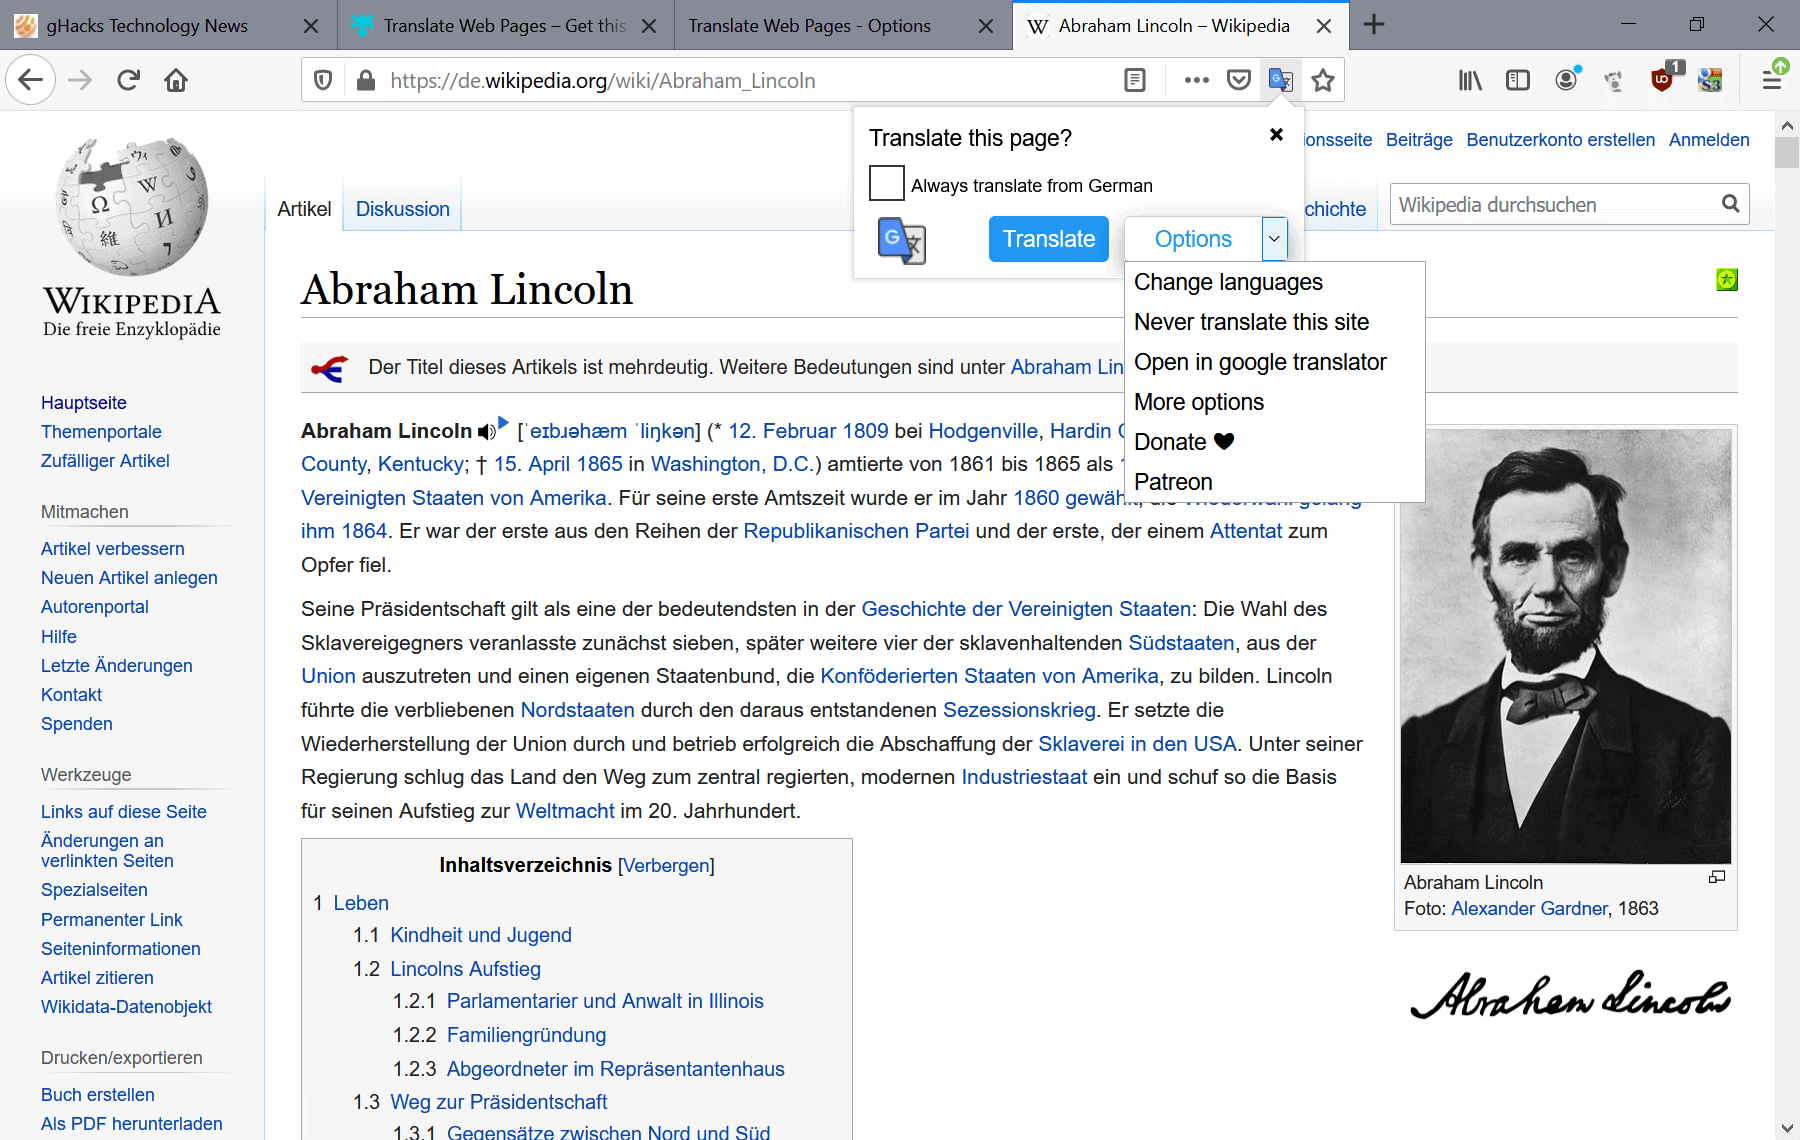 firefox translate web -pages addon